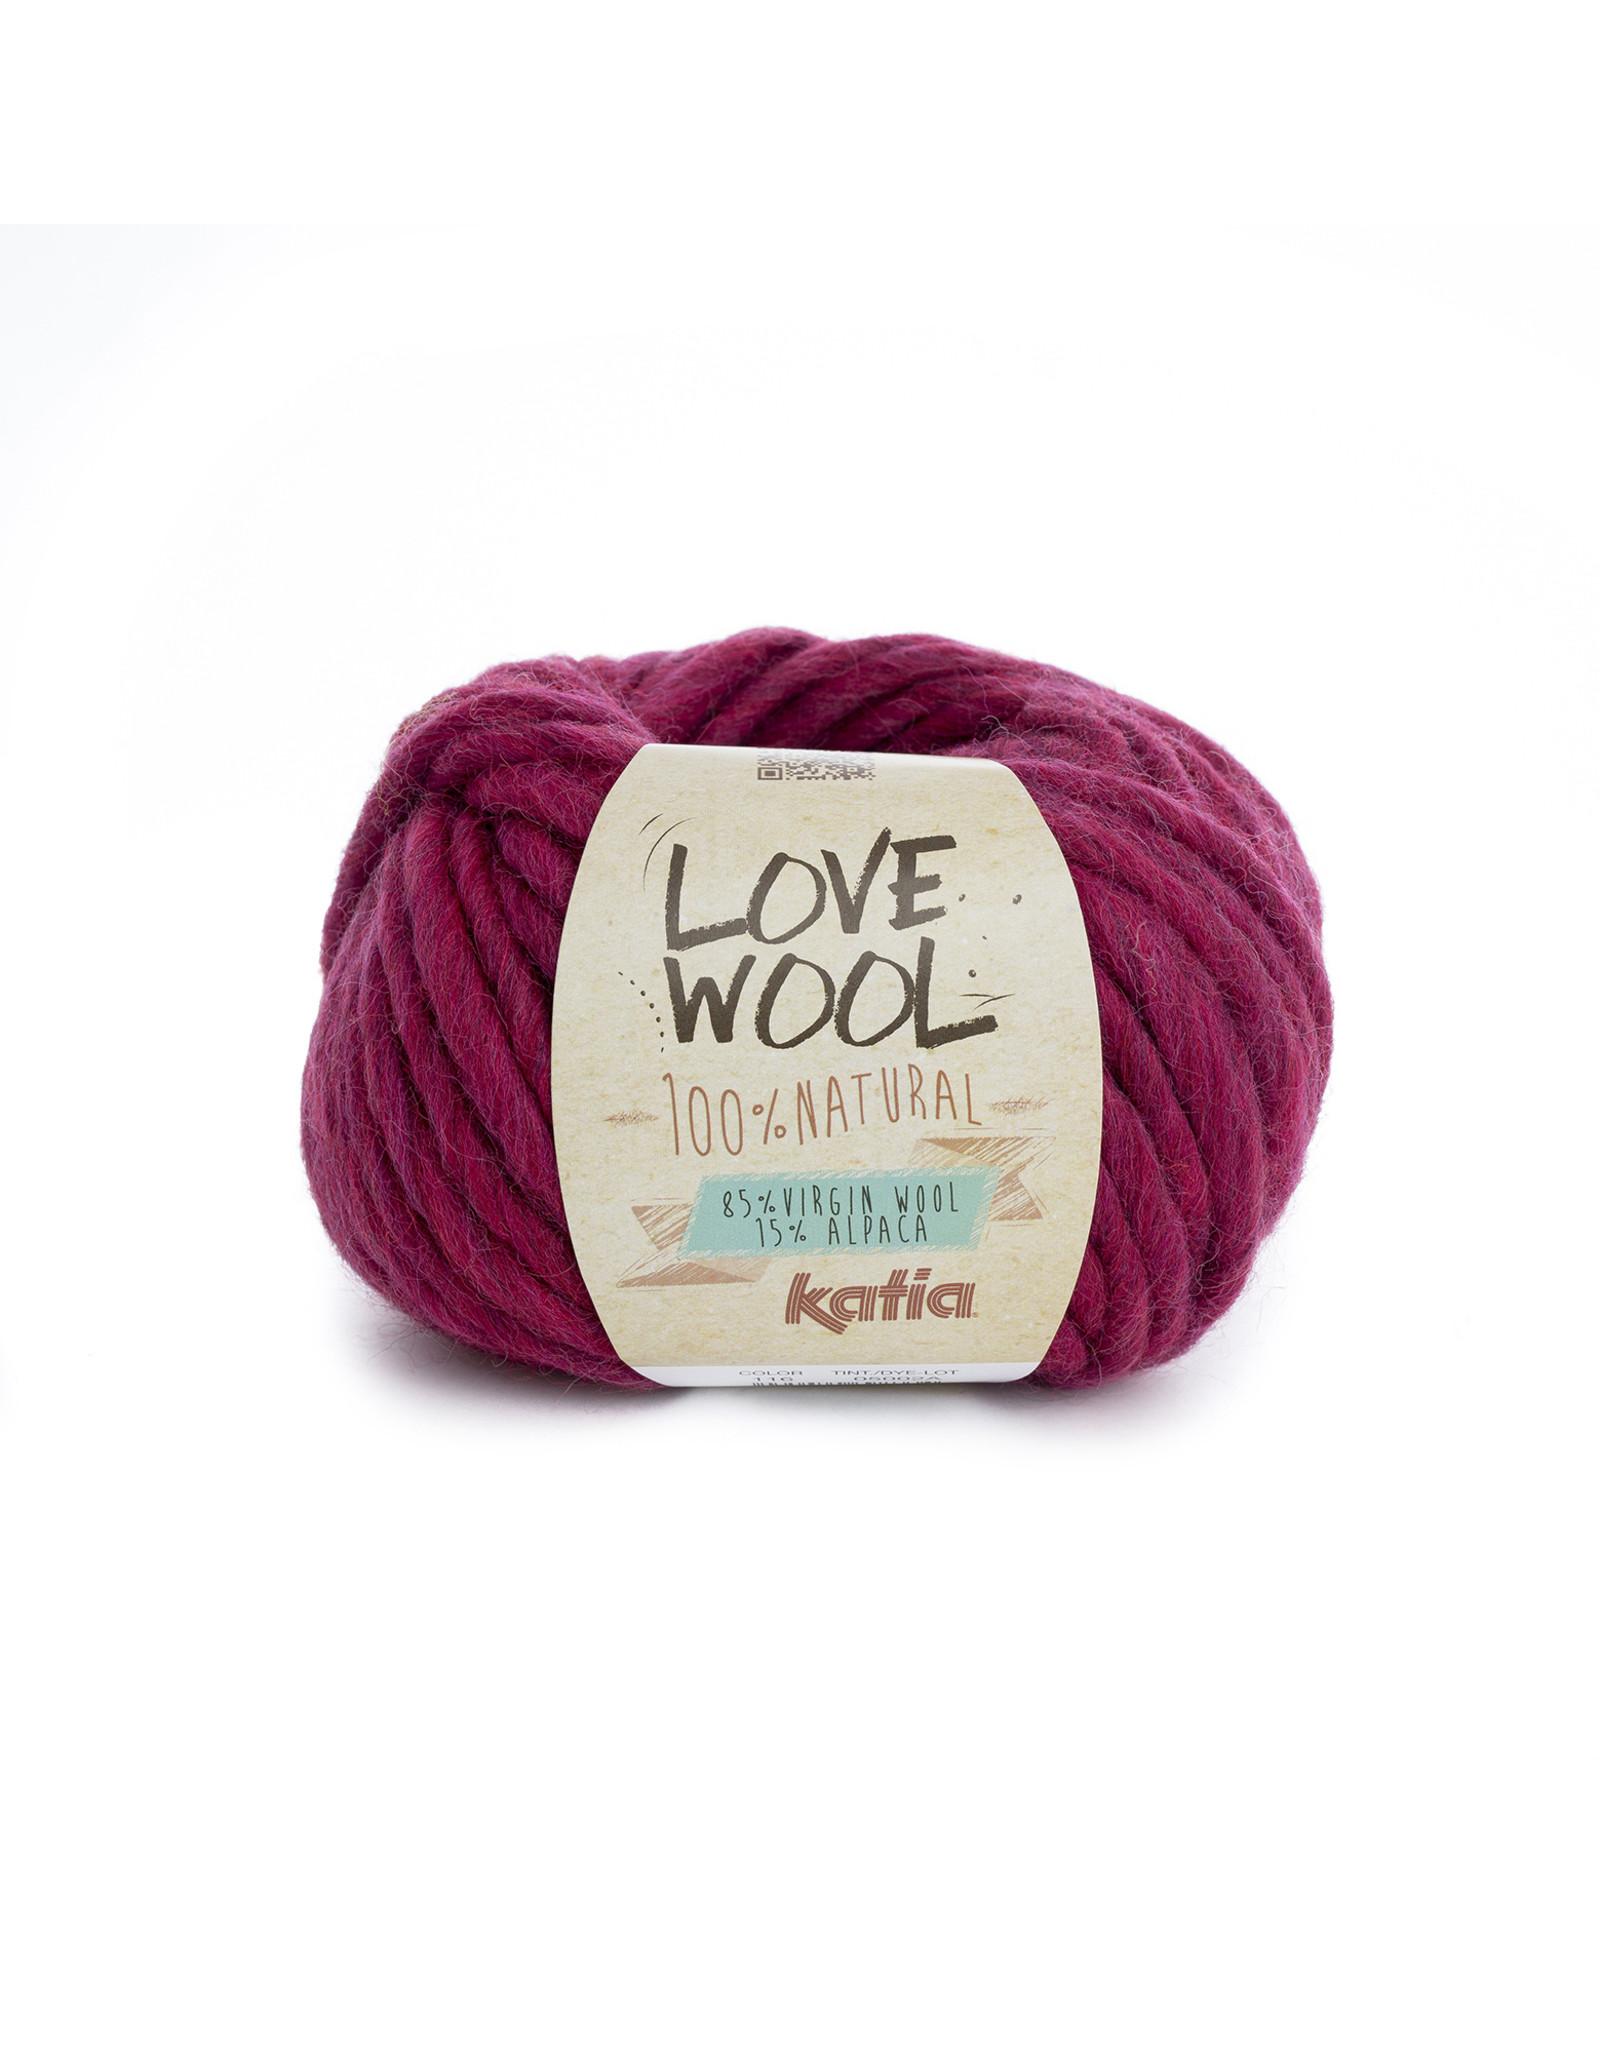 Katia Katia - Love Wool - kleur 116 - Fuchsia - 100 gr. = 50 m.